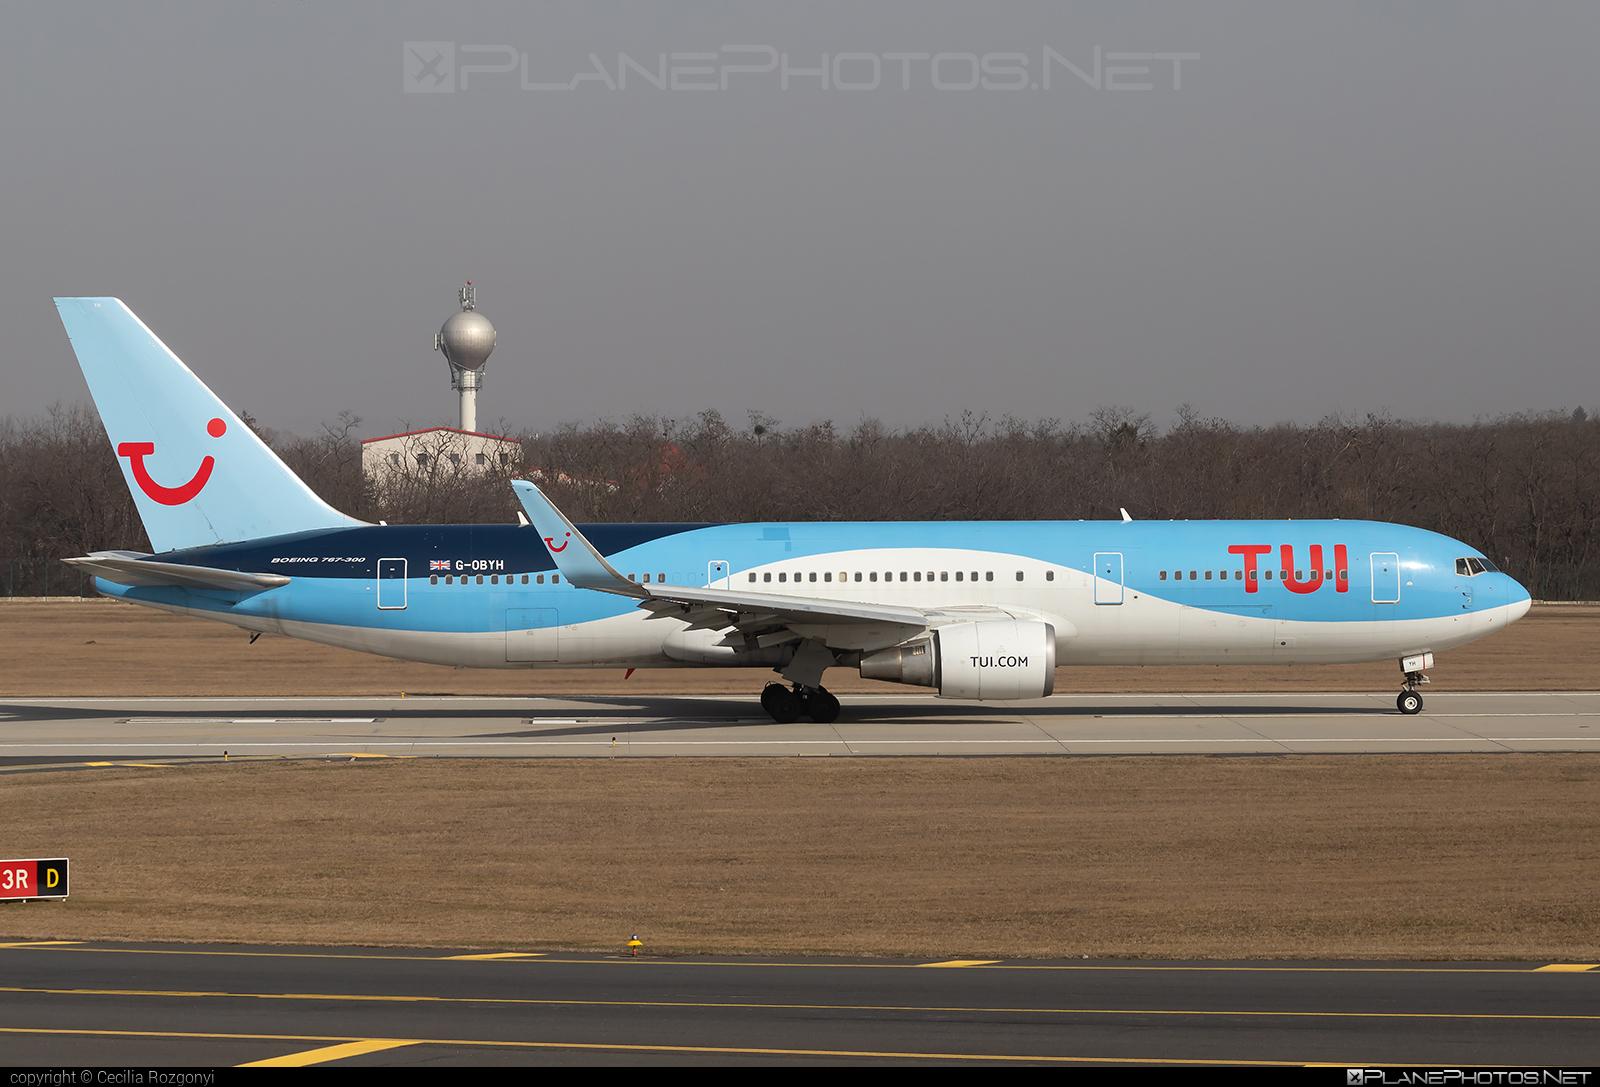 Boeing 767-300ER - G-OBYH operated by TUI Airways #b767 #b767er #boeing #boeing767 #tuiairways